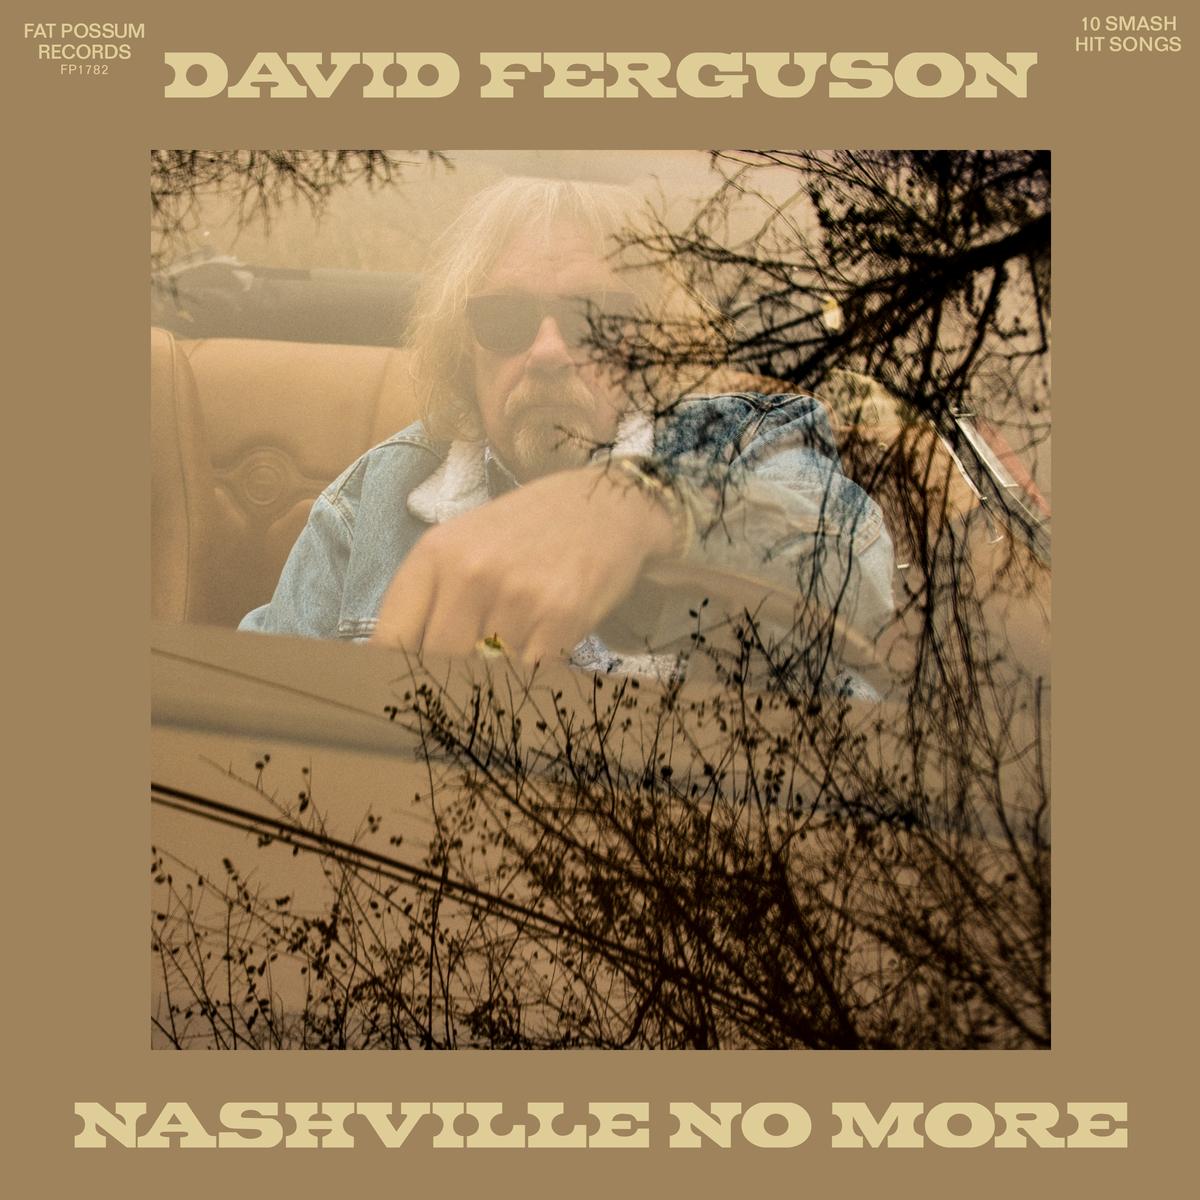 David Ferguson Nashville No More cover